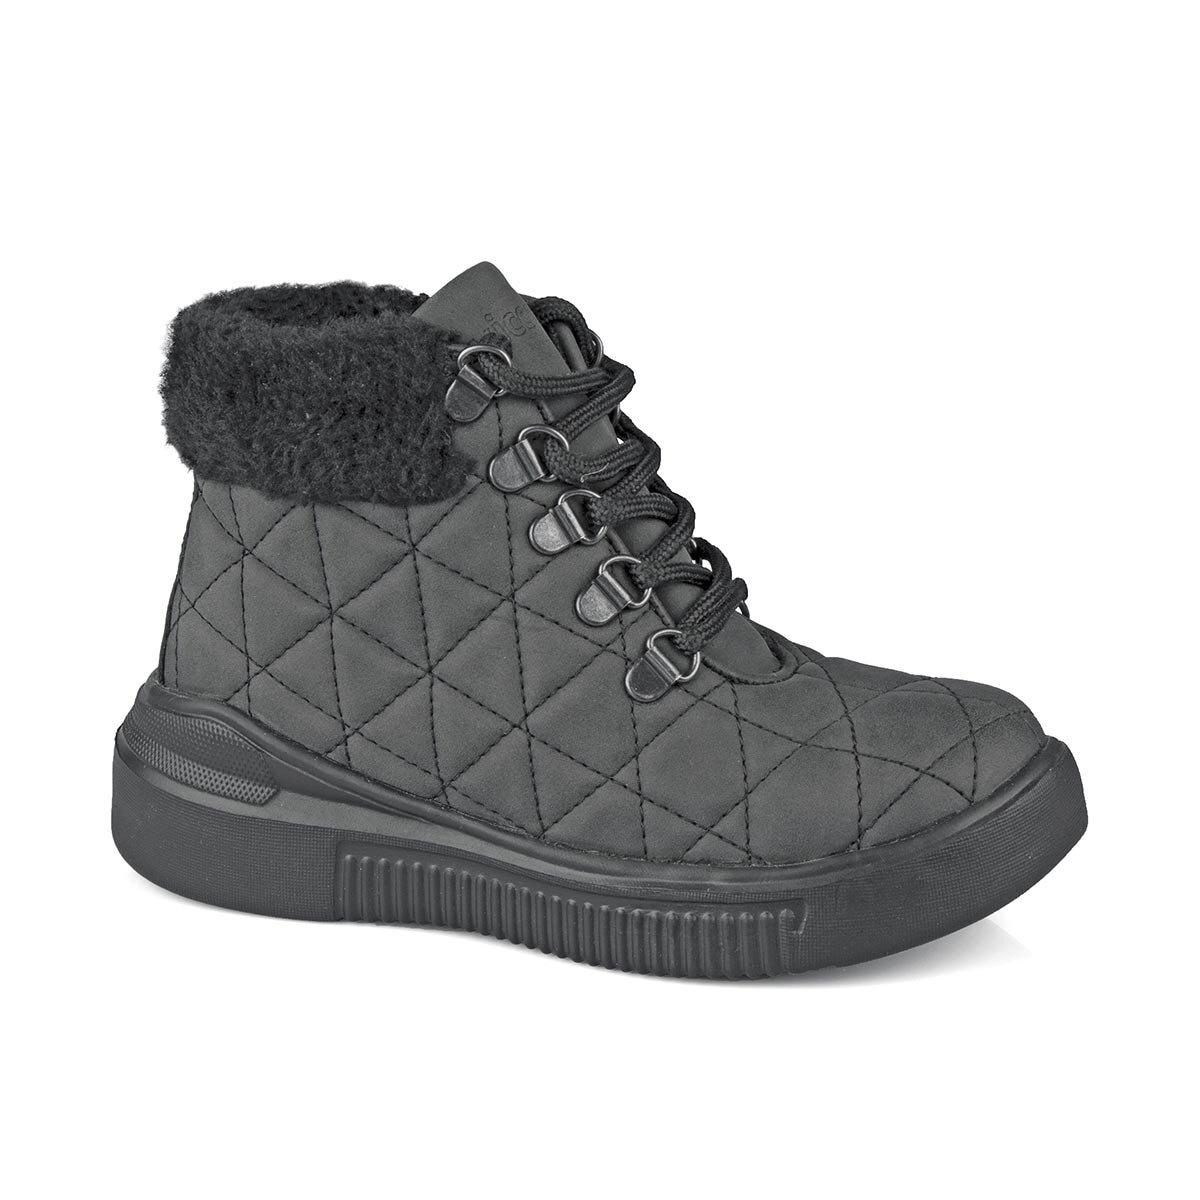 FLO 946. F19K. 266 FILET BOOTS Black Female Child Boots VICCO